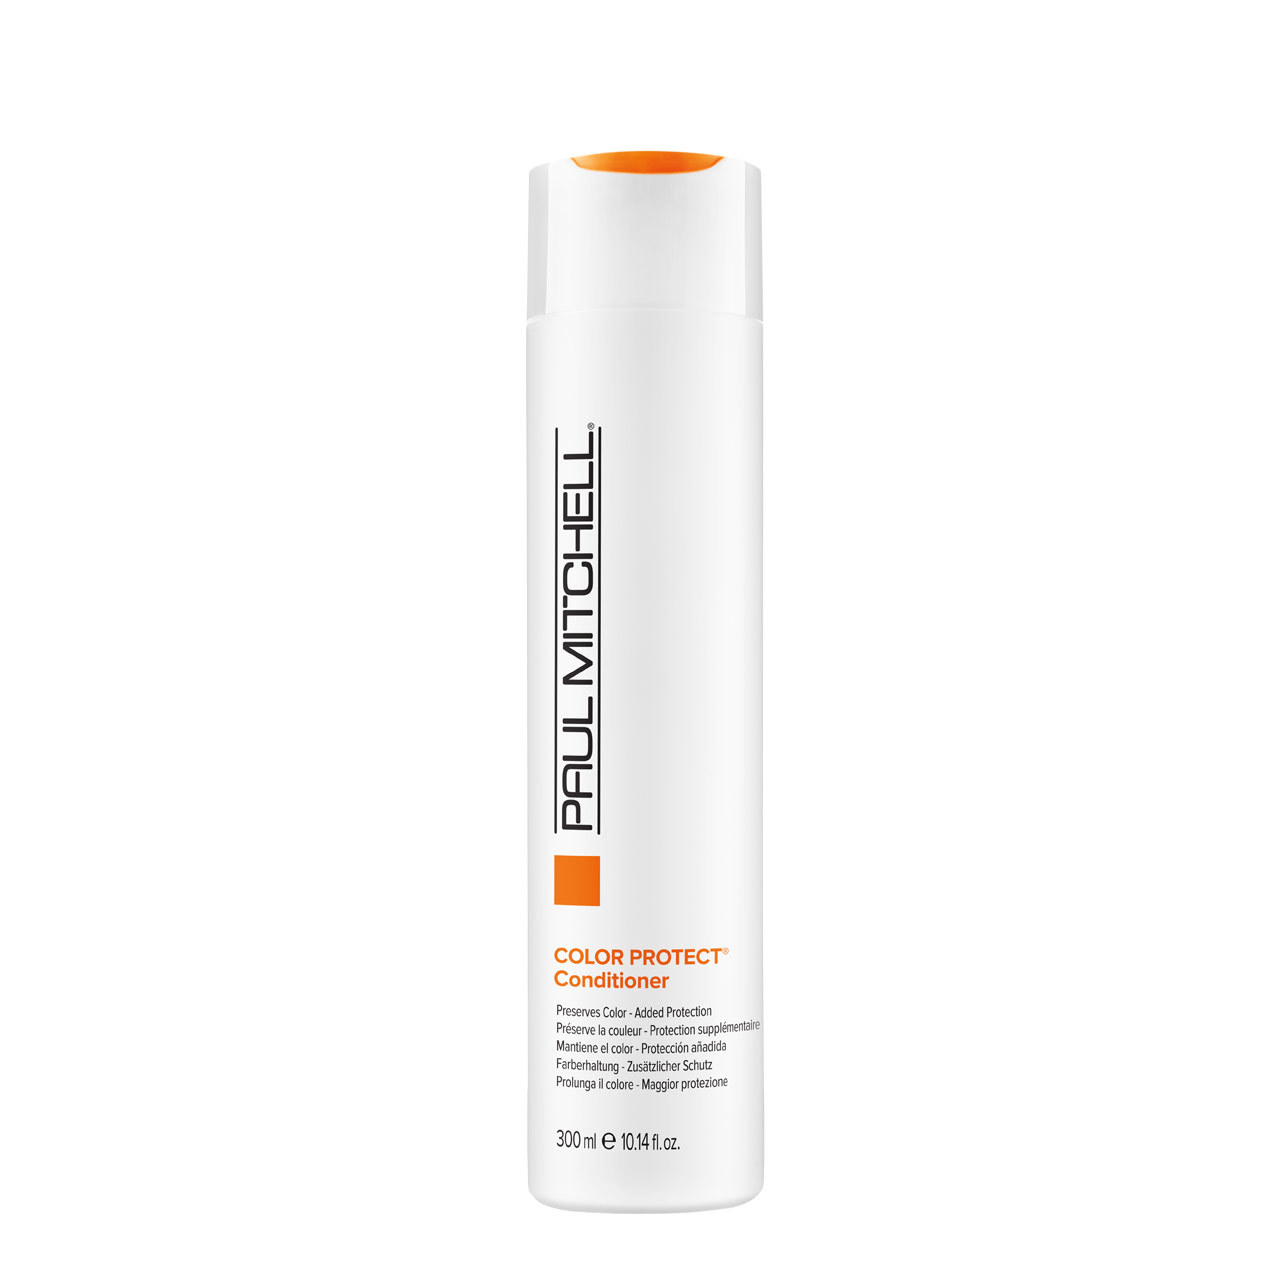 Color Protect® Conditioner obsah (ml): 300ml